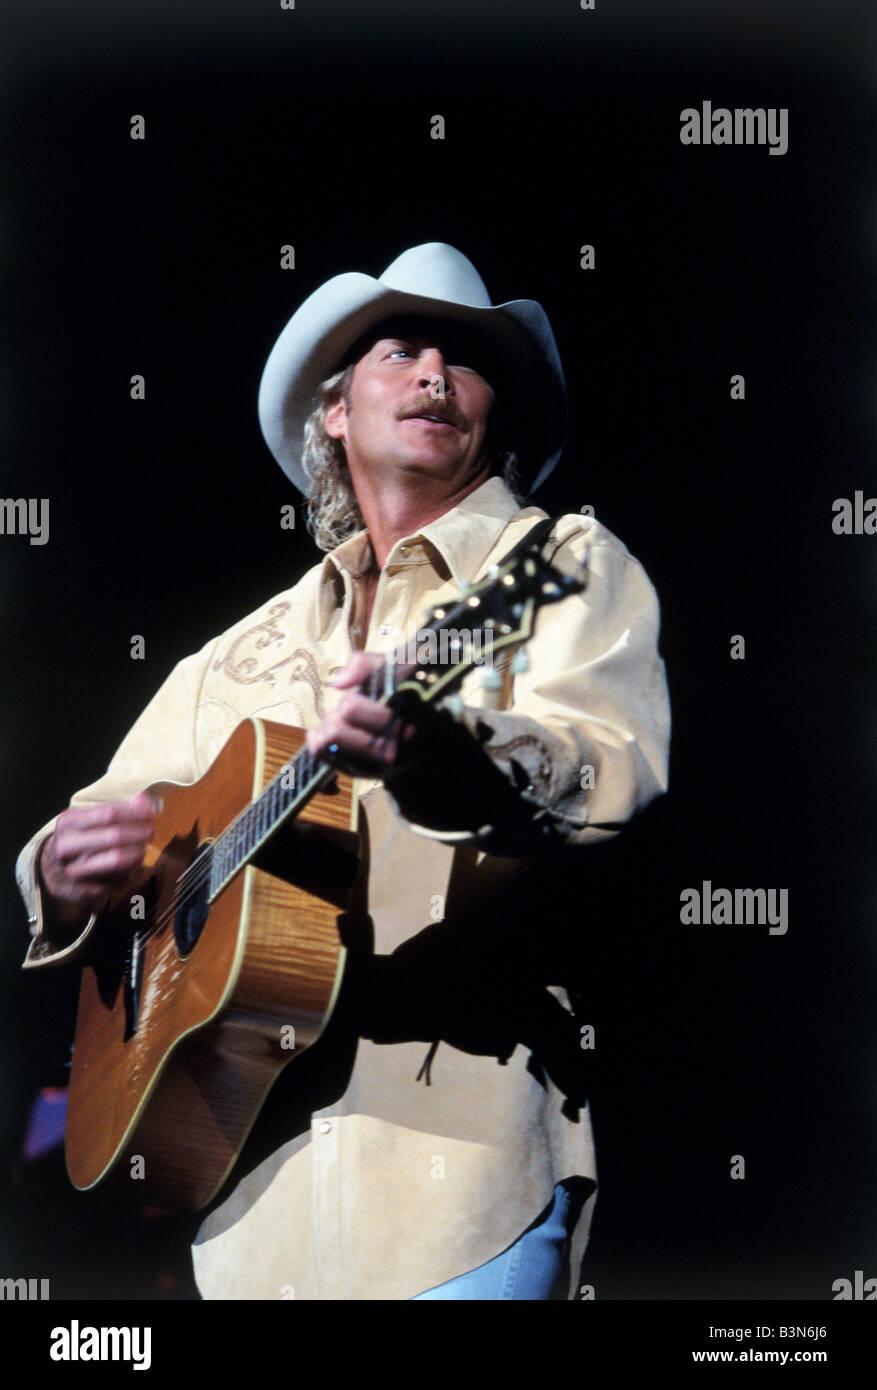 ALAN JACKSON   US Country & Western musician - Stock Image